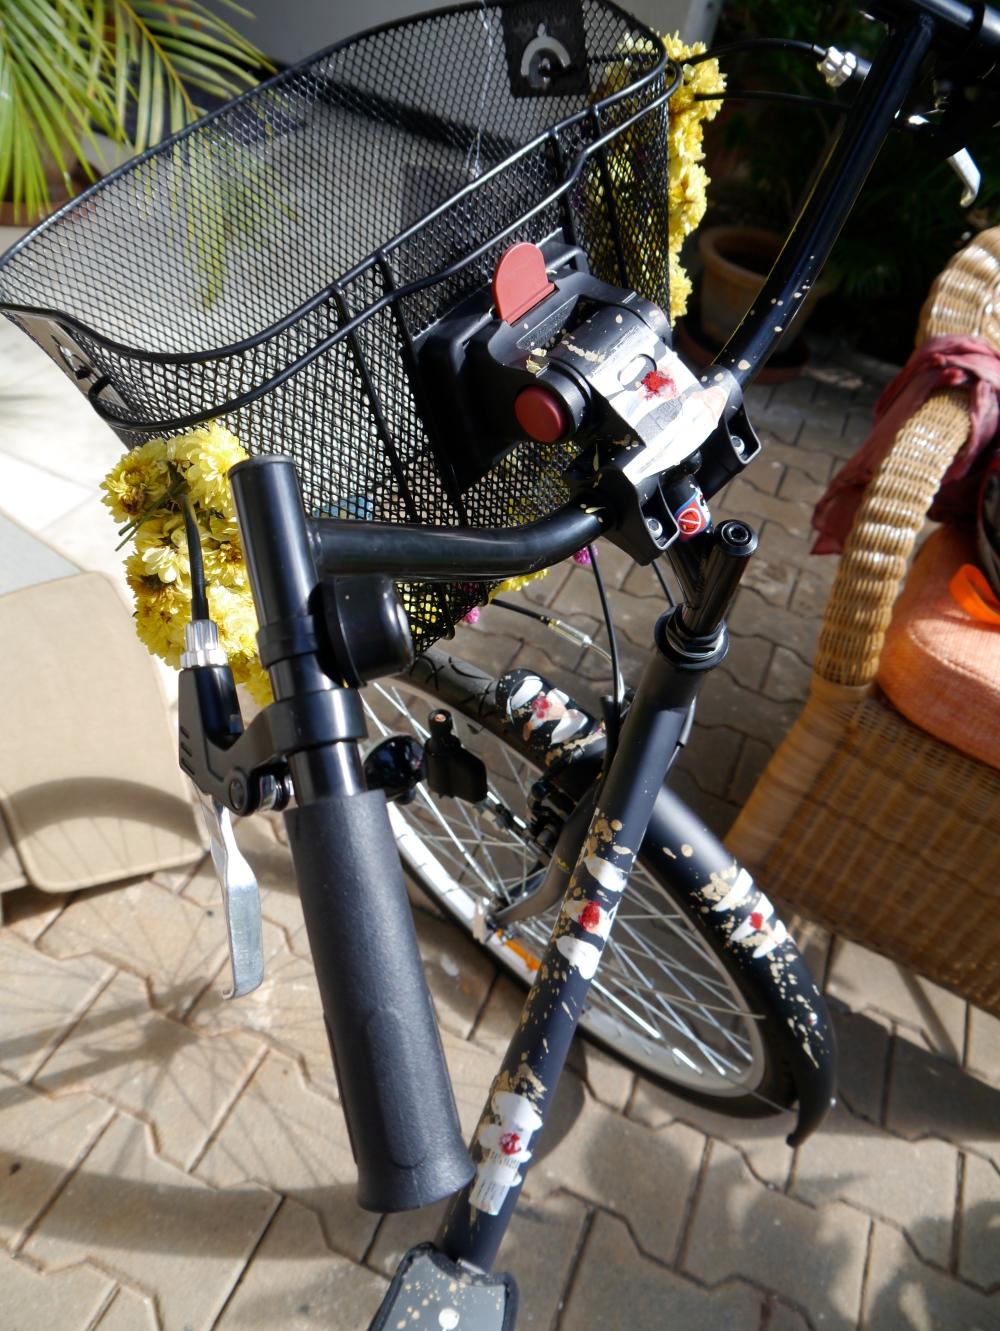 Dussehra part 2 - my bike